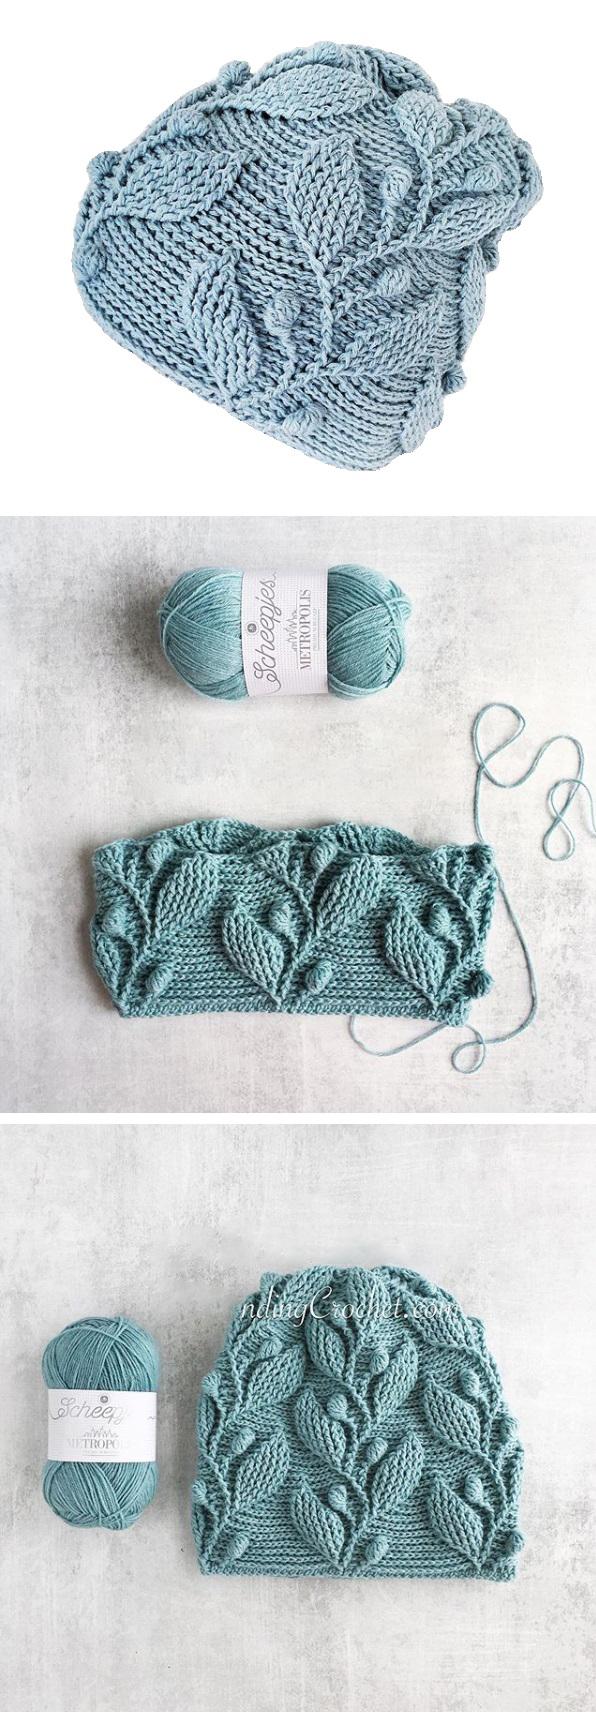 Crochet Leaf Beanie – Handmade Paris #crochetdiy